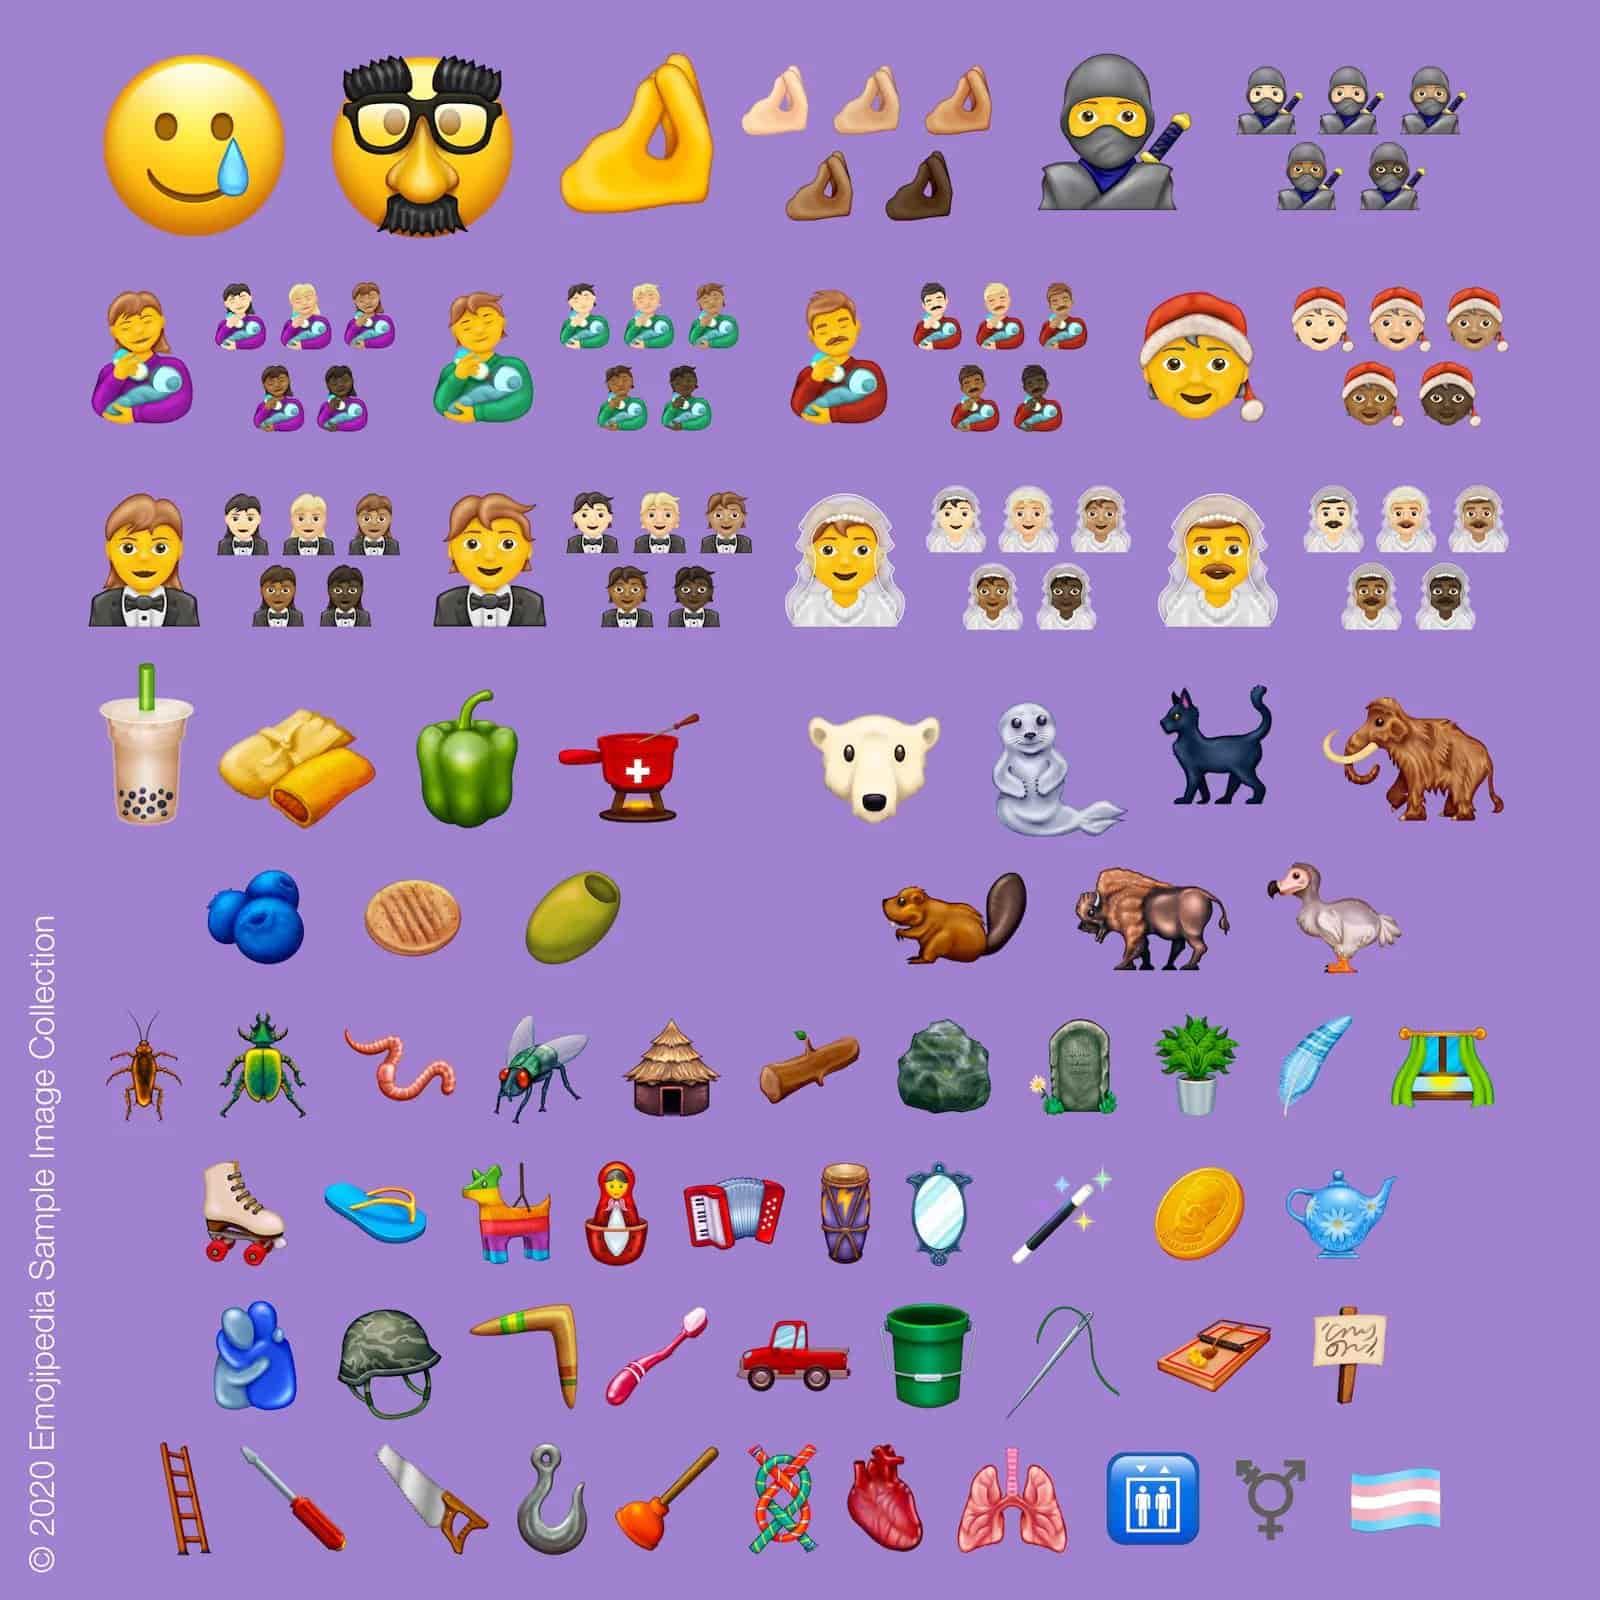 Emoji 2020 Mano